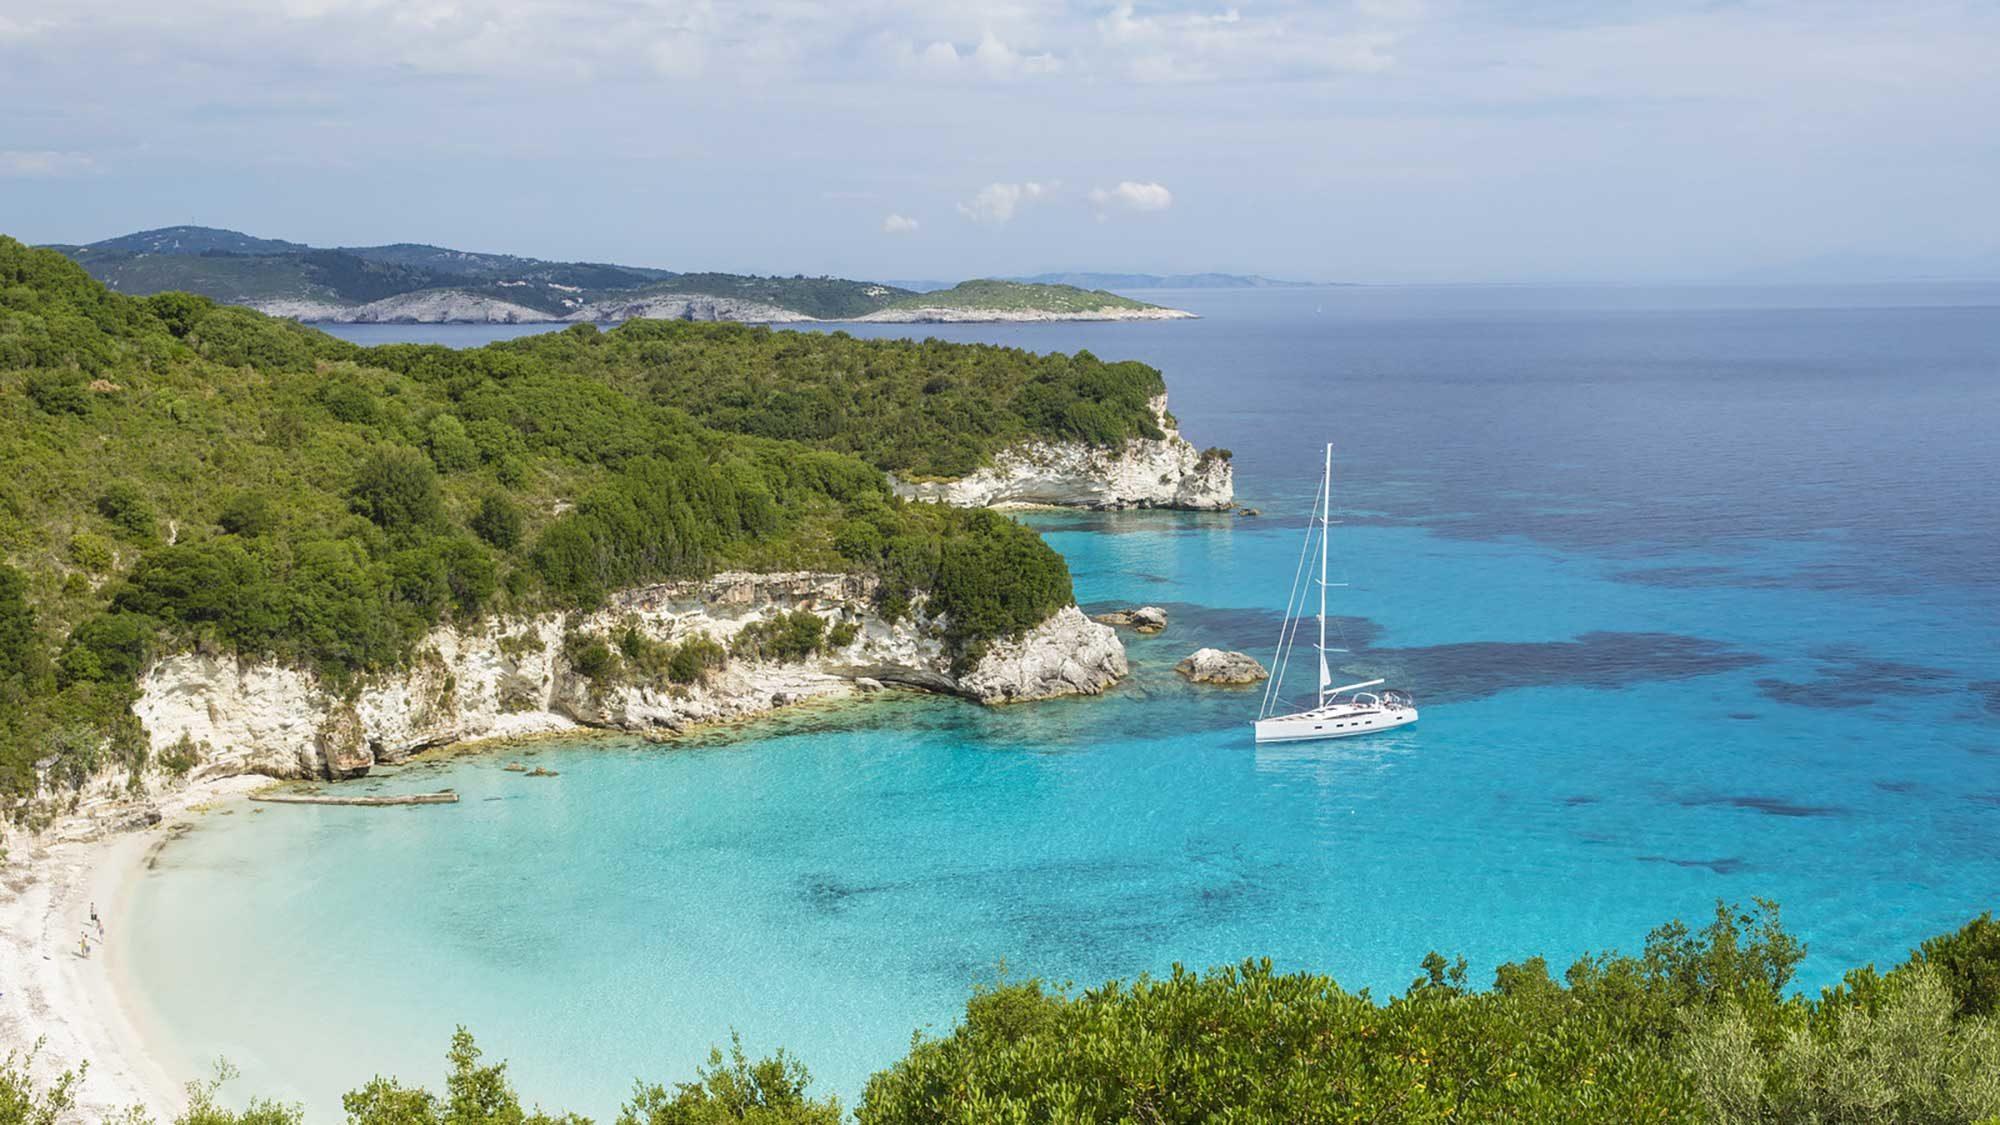 Argentous 3 sailing around Corfu